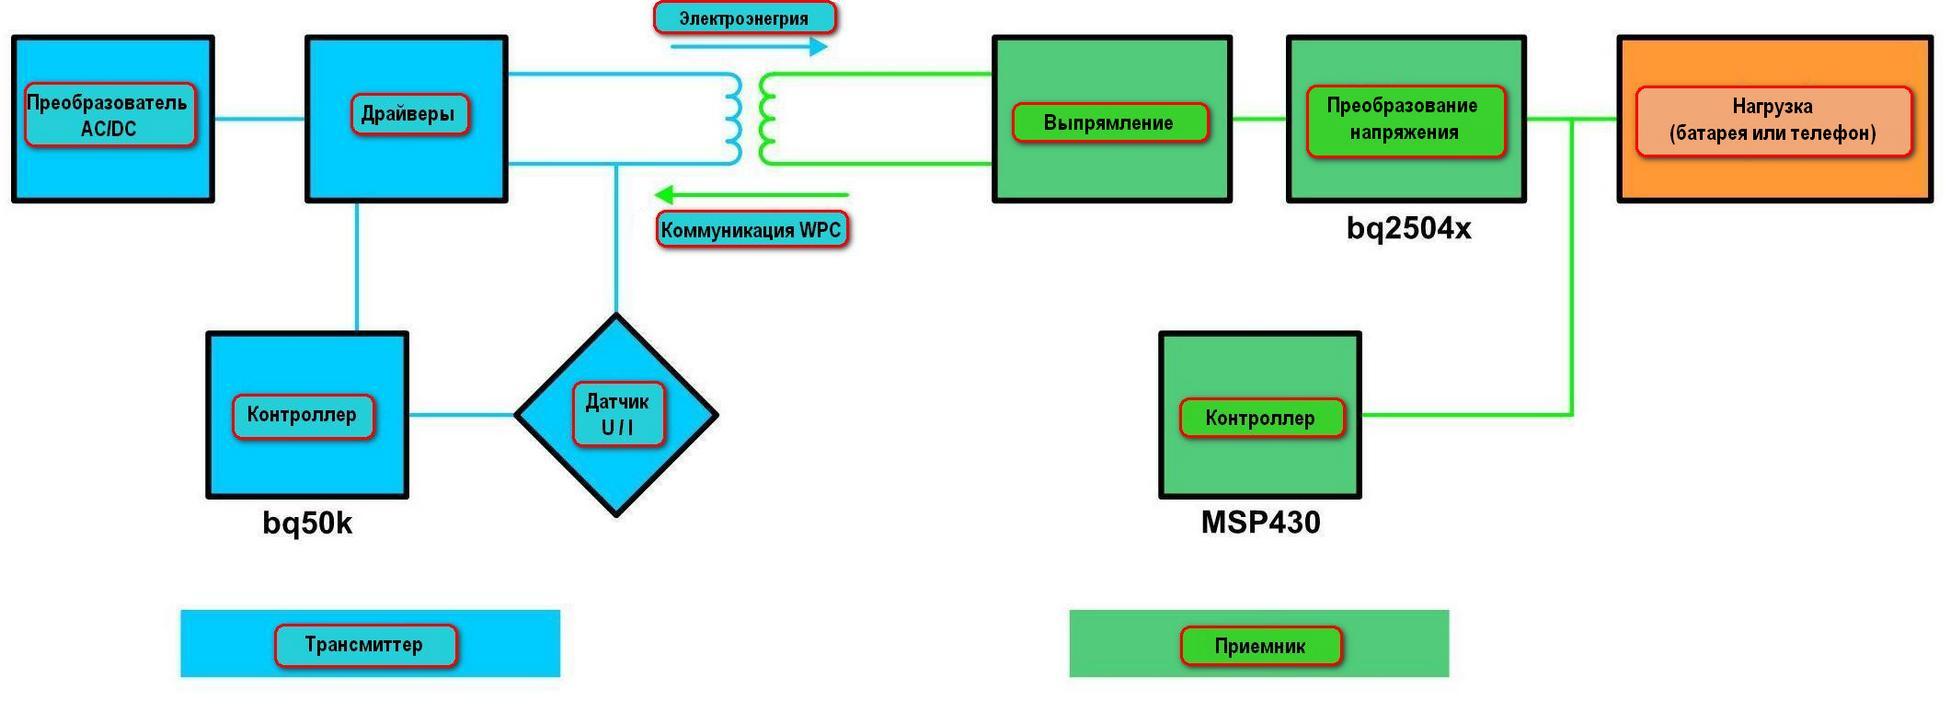 texas instruments wireless power transmitter manager bq500110. Black Bedroom Furniture Sets. Home Design Ideas